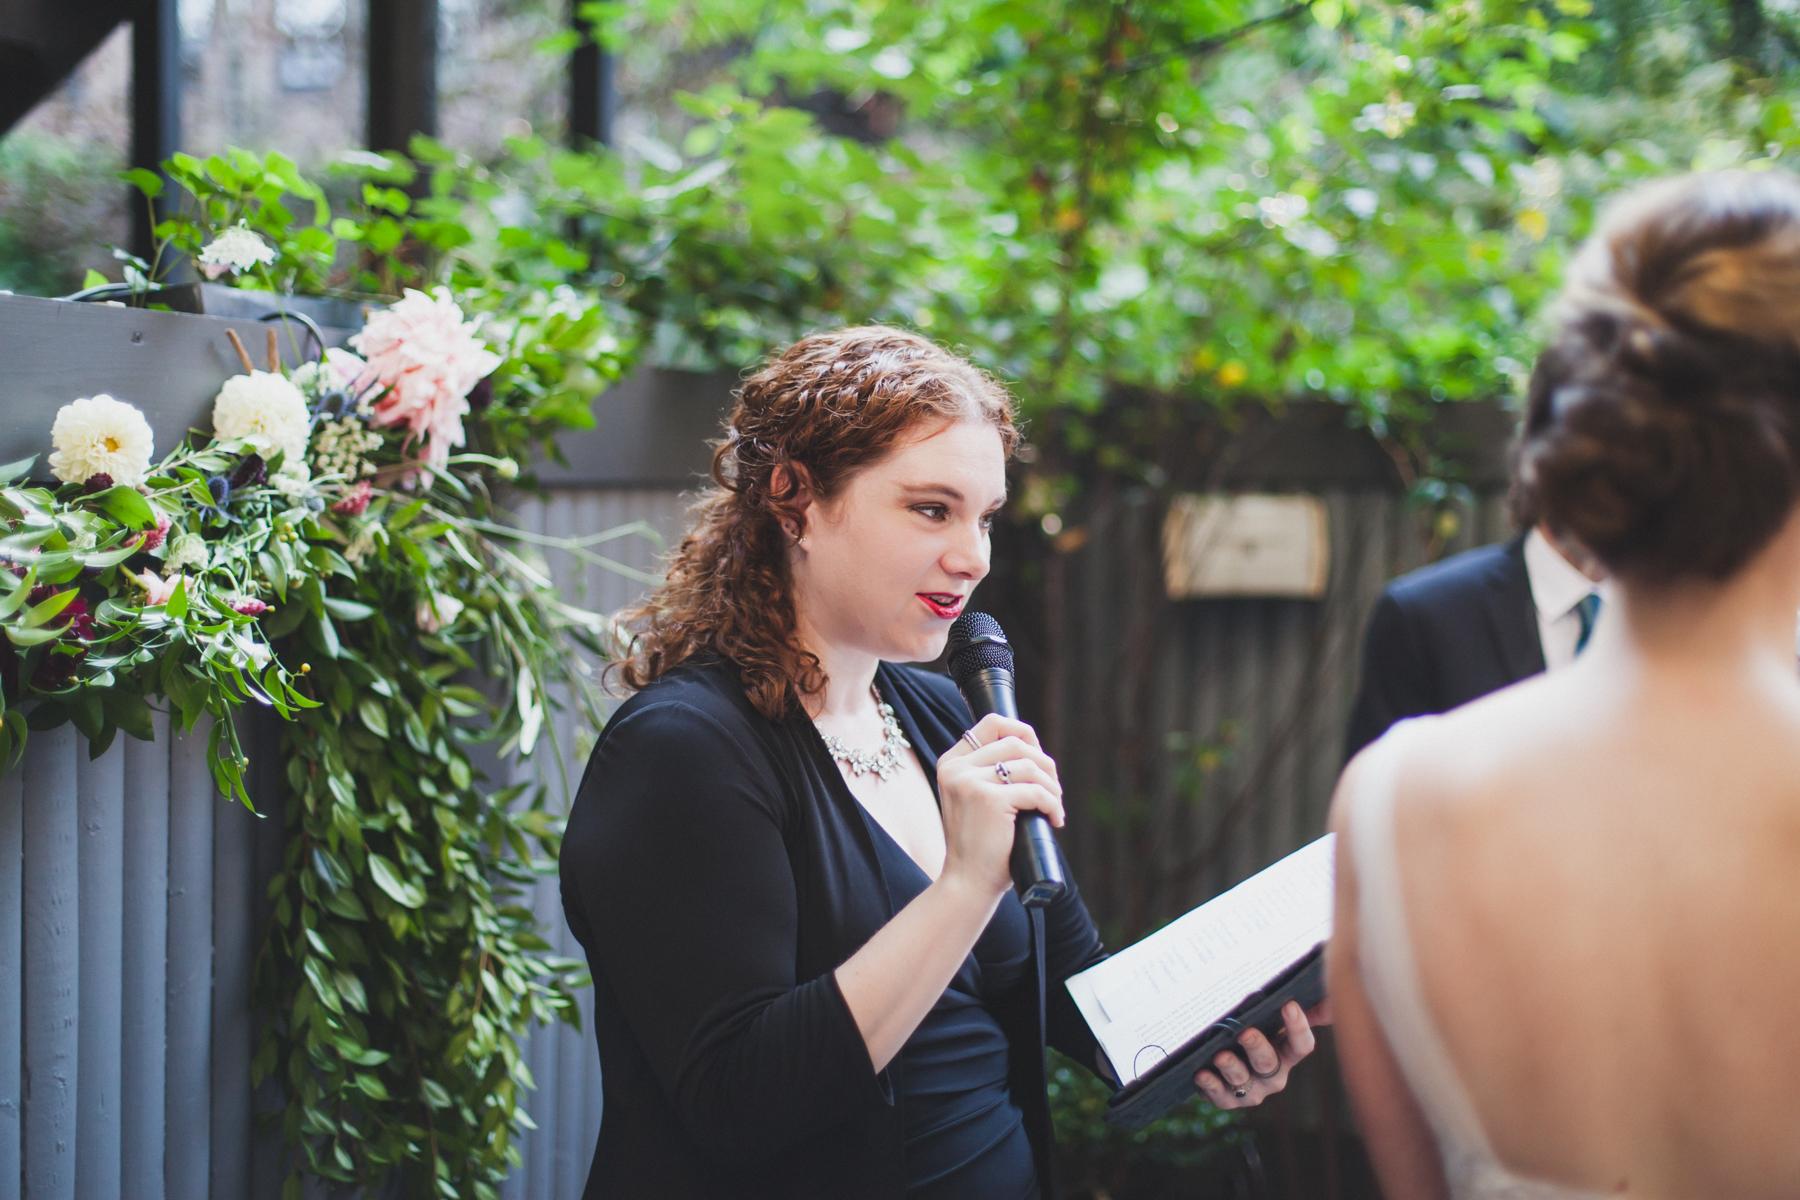 ICI-Restaurant-Fort-Greene-Brooklyn-Intimate-Documentary-Wedding-Photography-Elvira-Kalviste-33.jpg